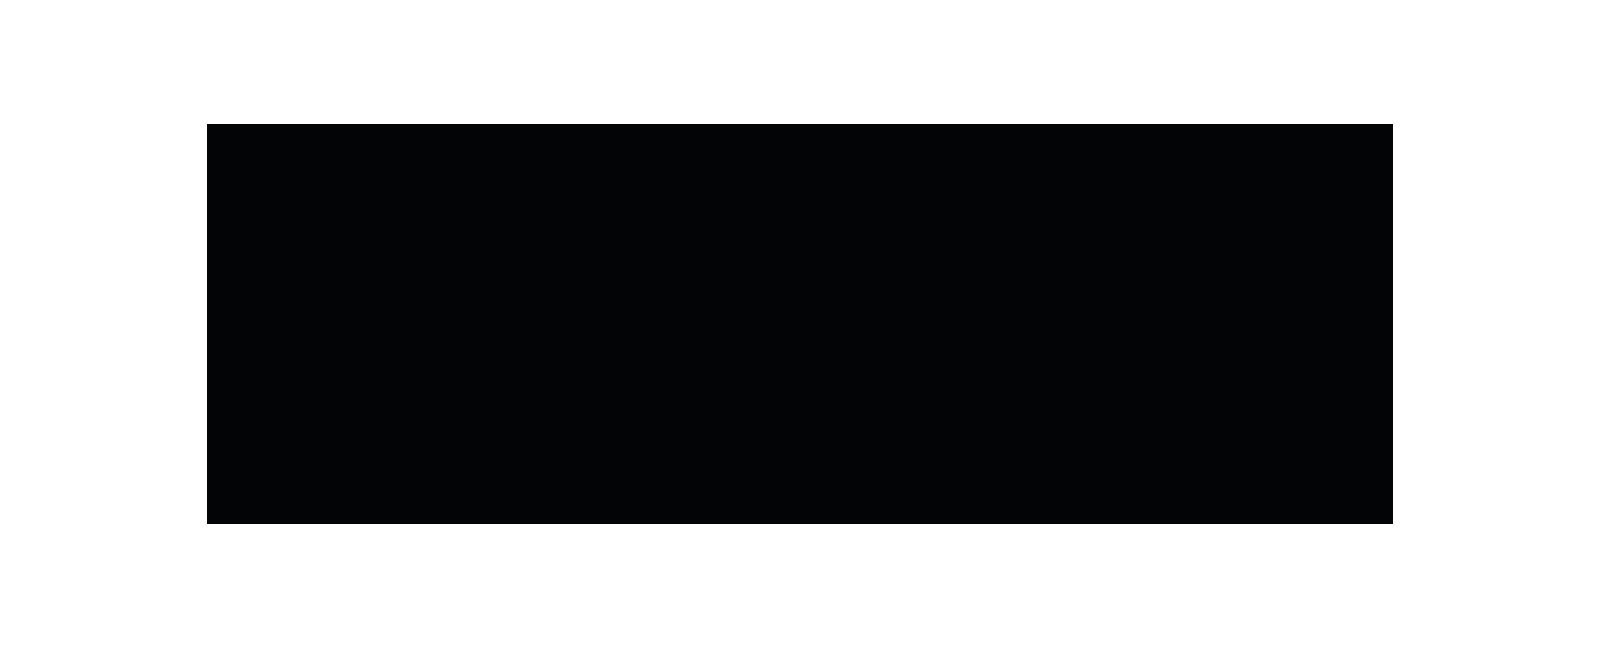 FABERNOVEL   Fabernovel